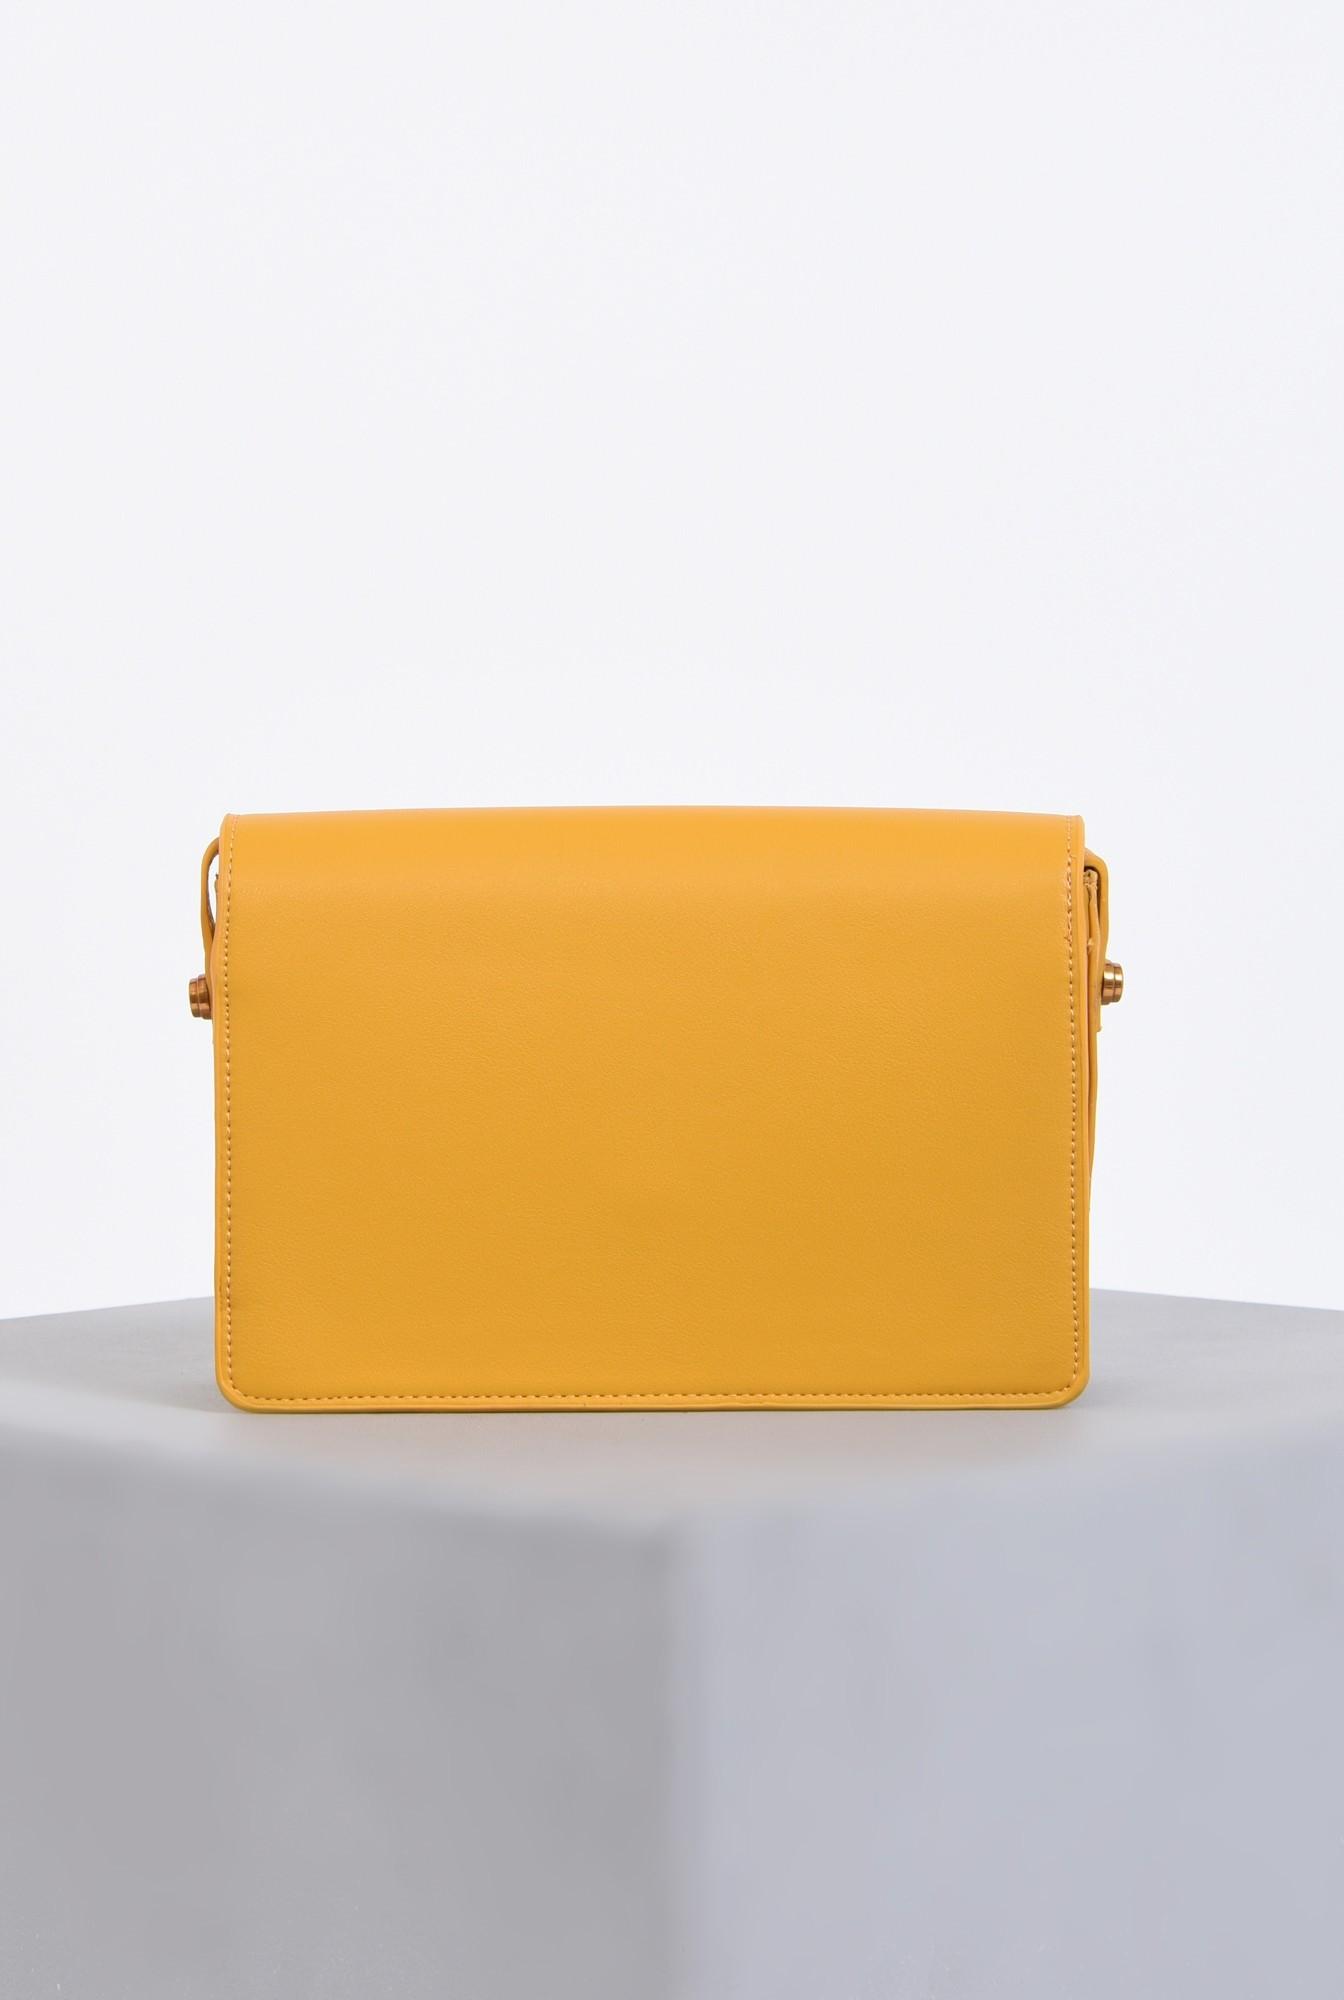 2 - geanta casual, mustar, medie, accesorii